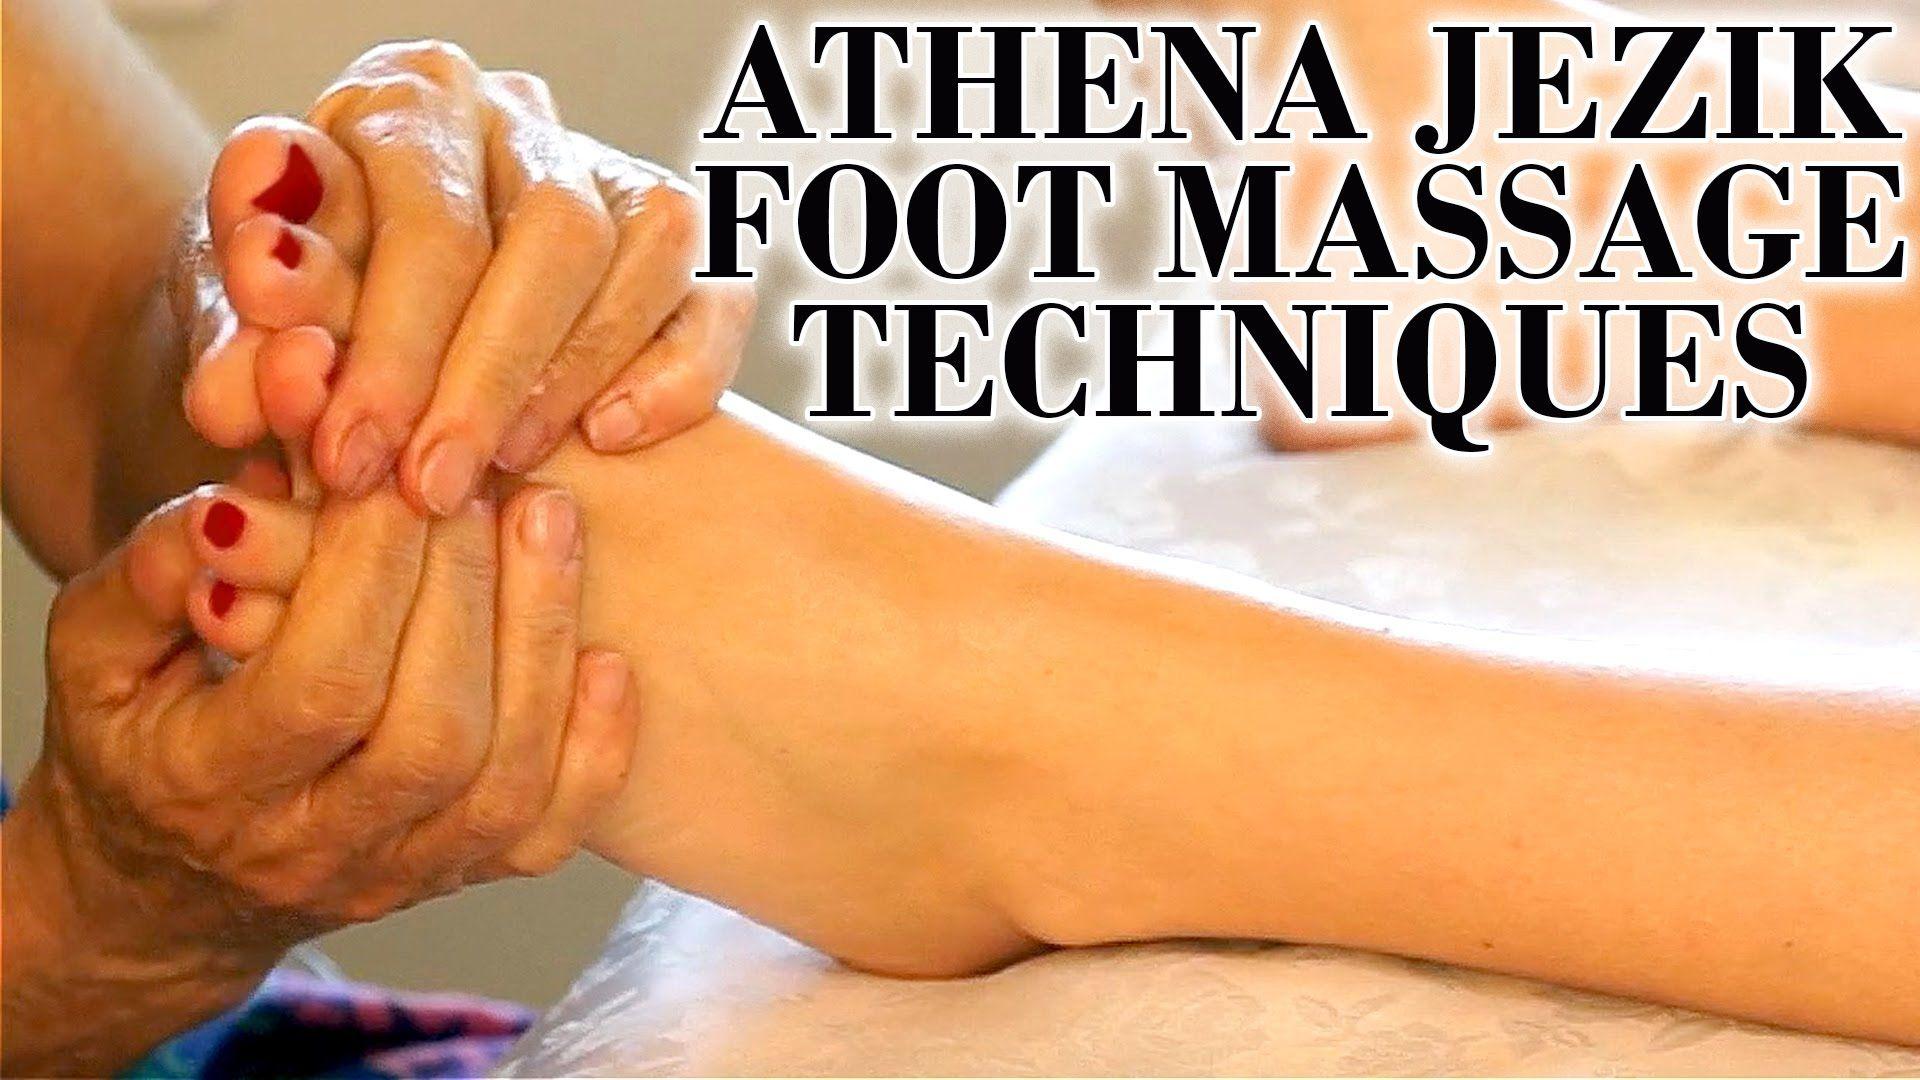 Athena Jezik Foot Massage Relaxation Techniques - Full -4859